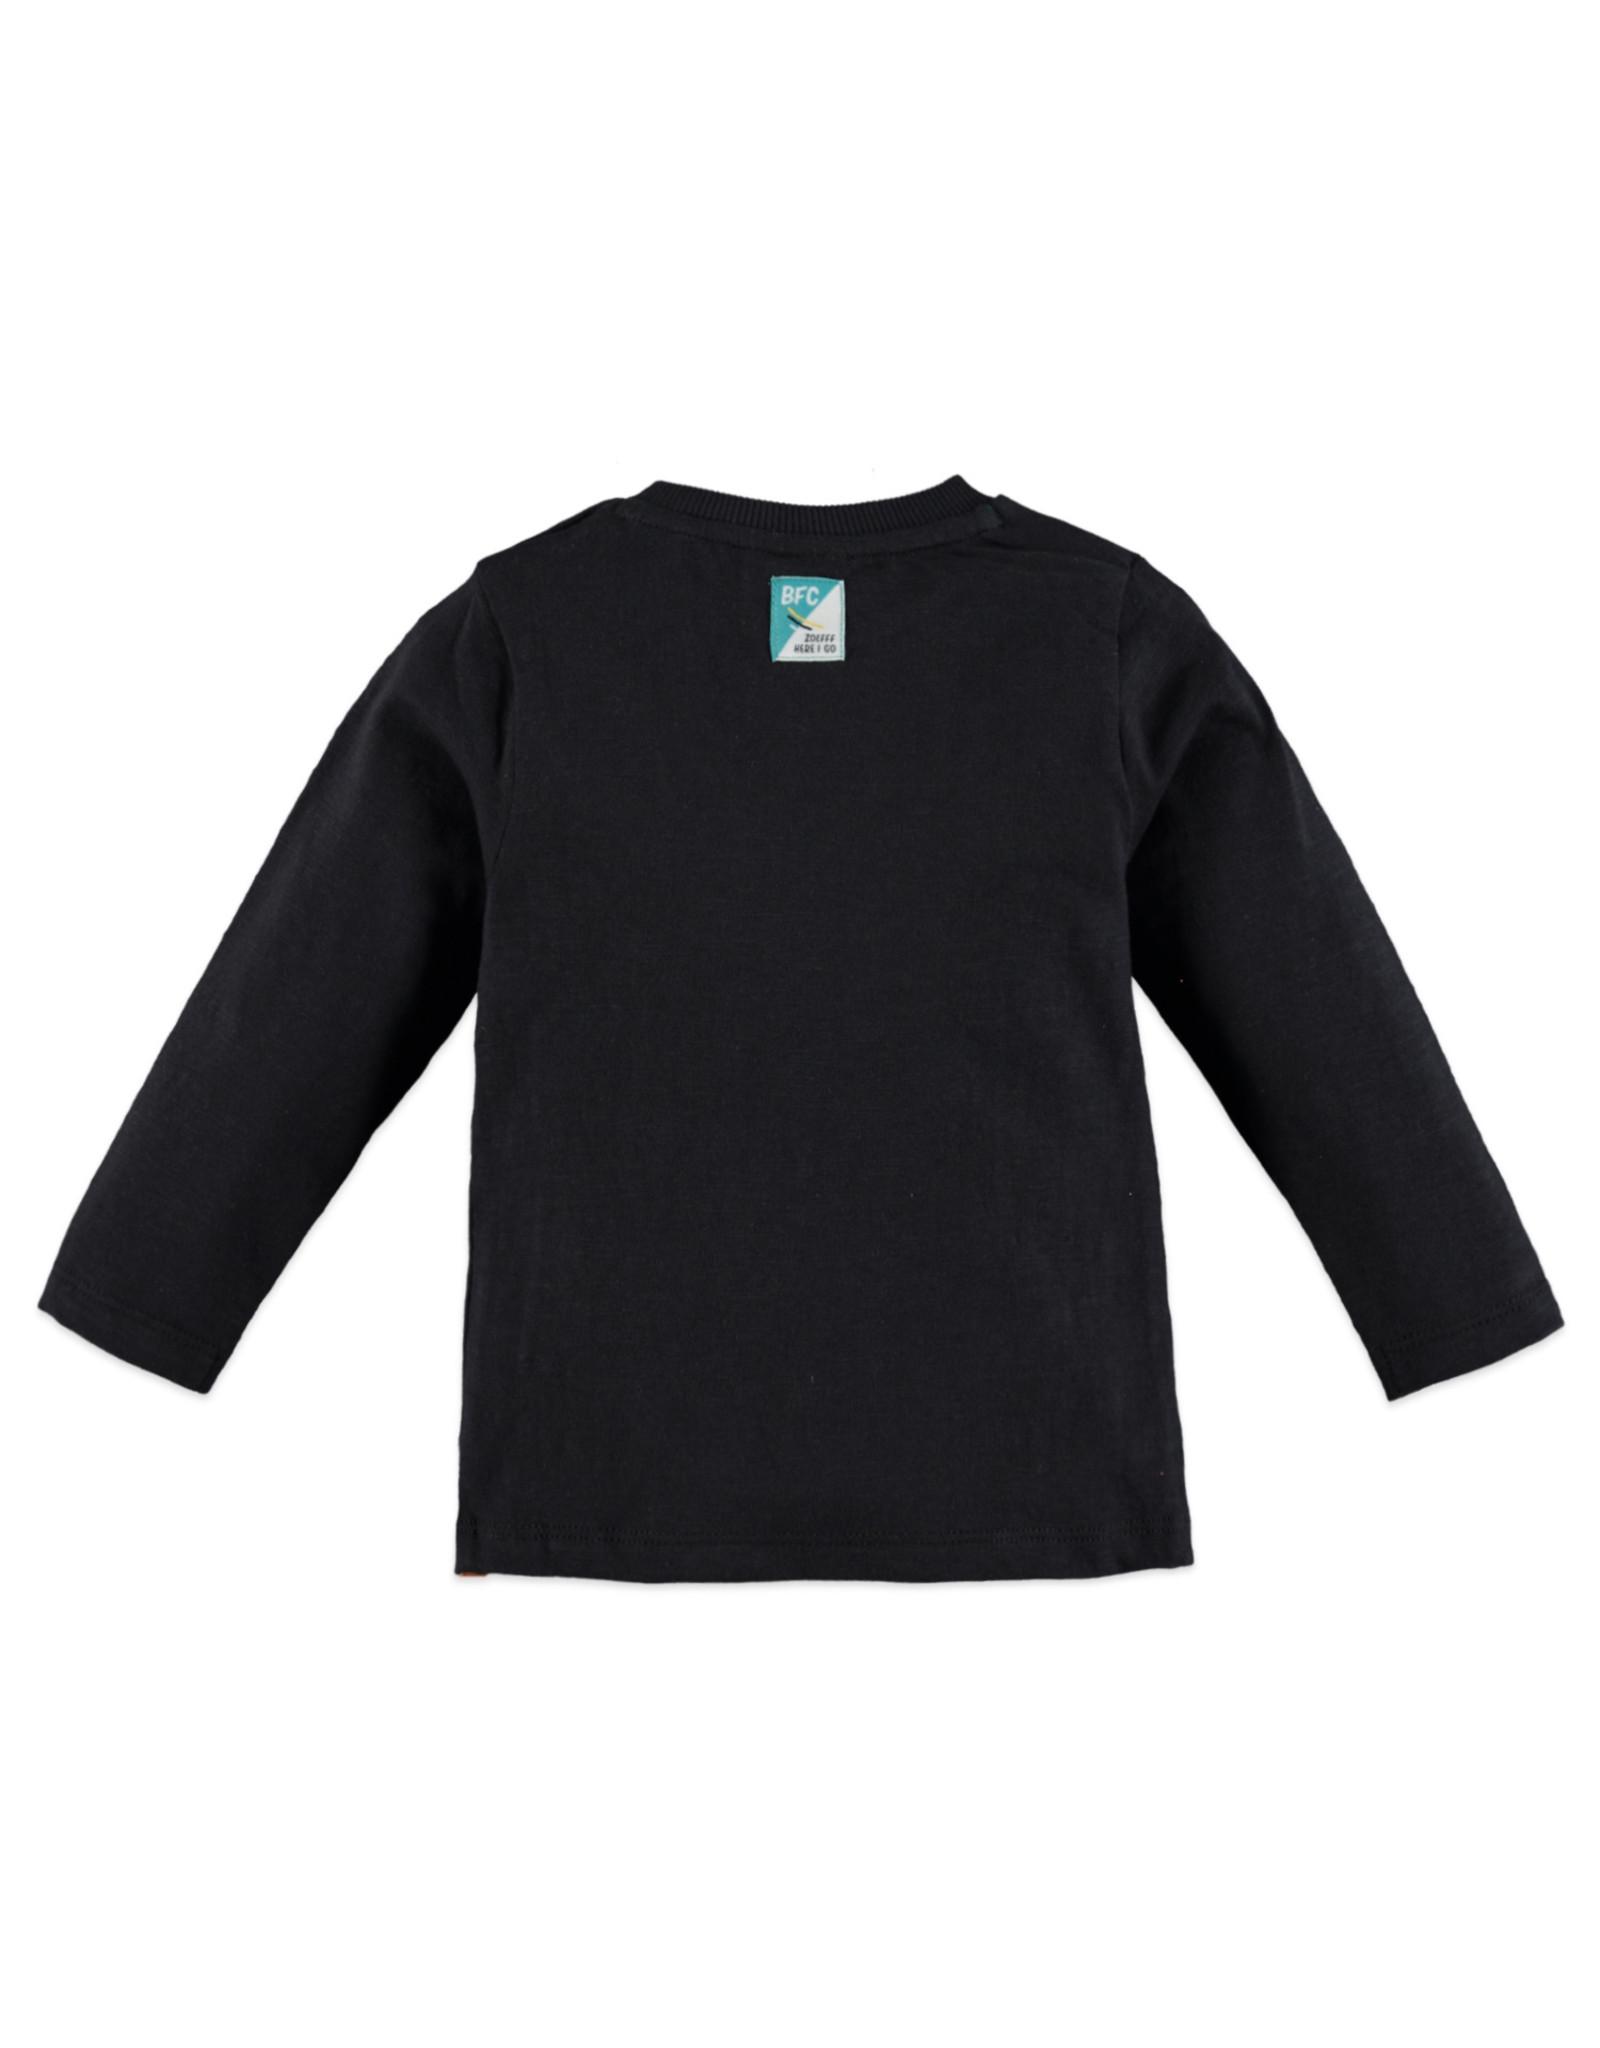 Babyface boys t-shirt long sleeve/night